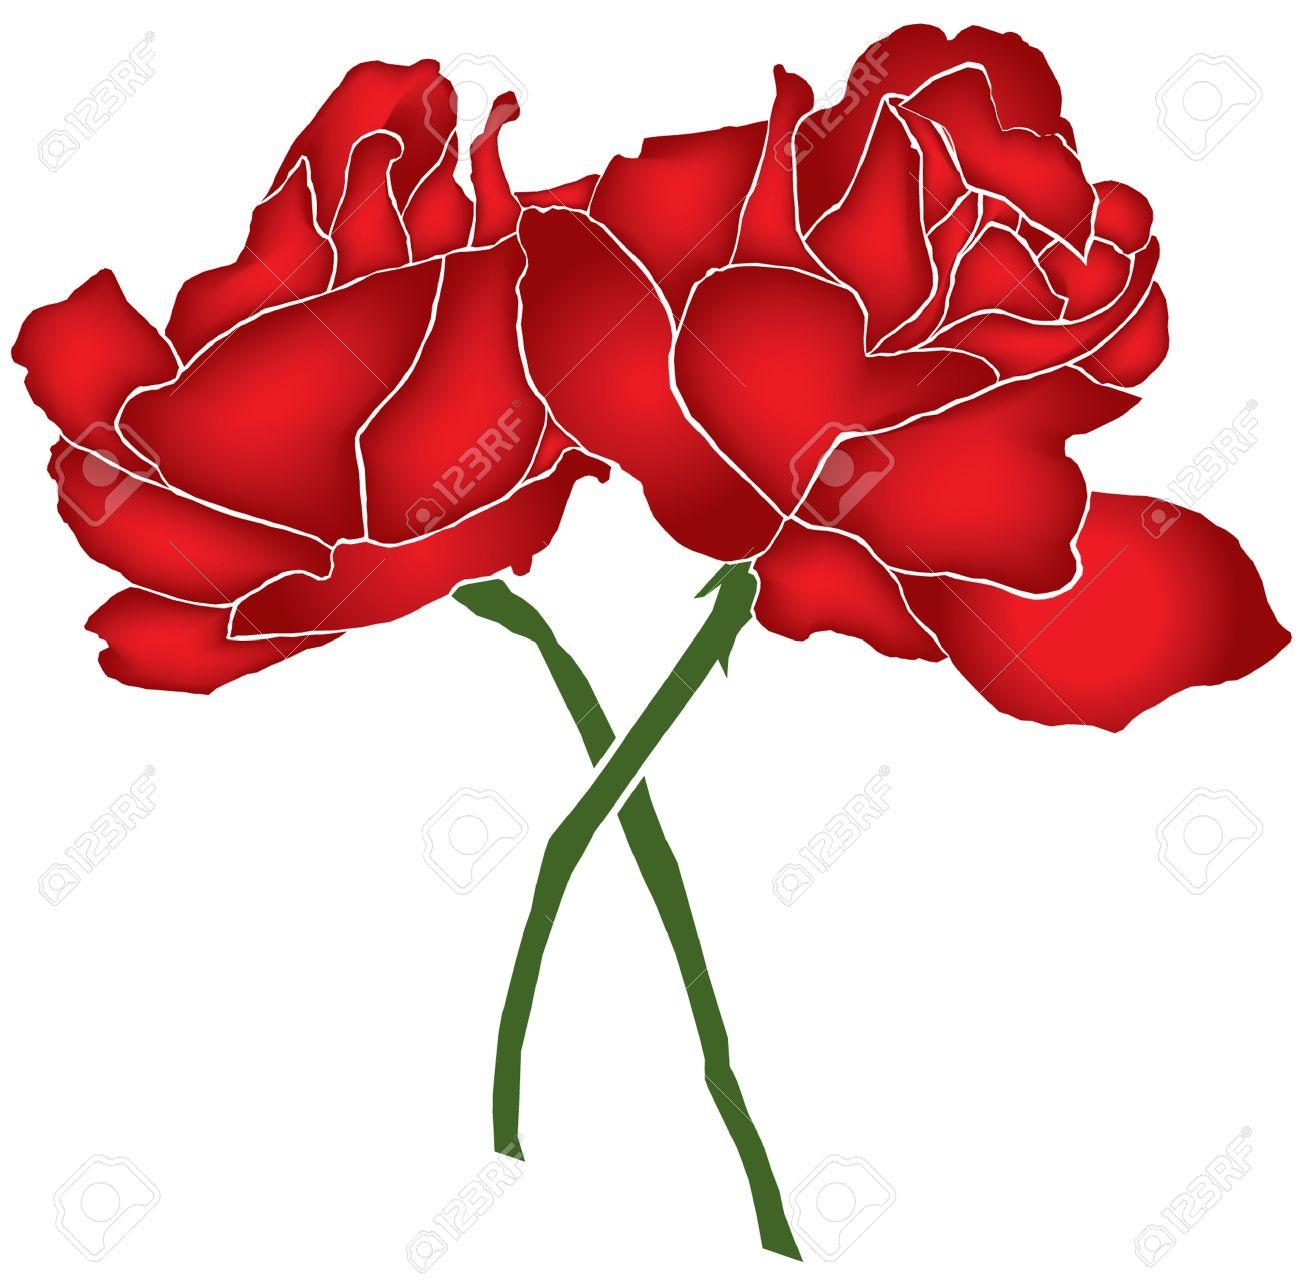 Elegant Red Roses Symbol Of Love For Your Design Royalty Free